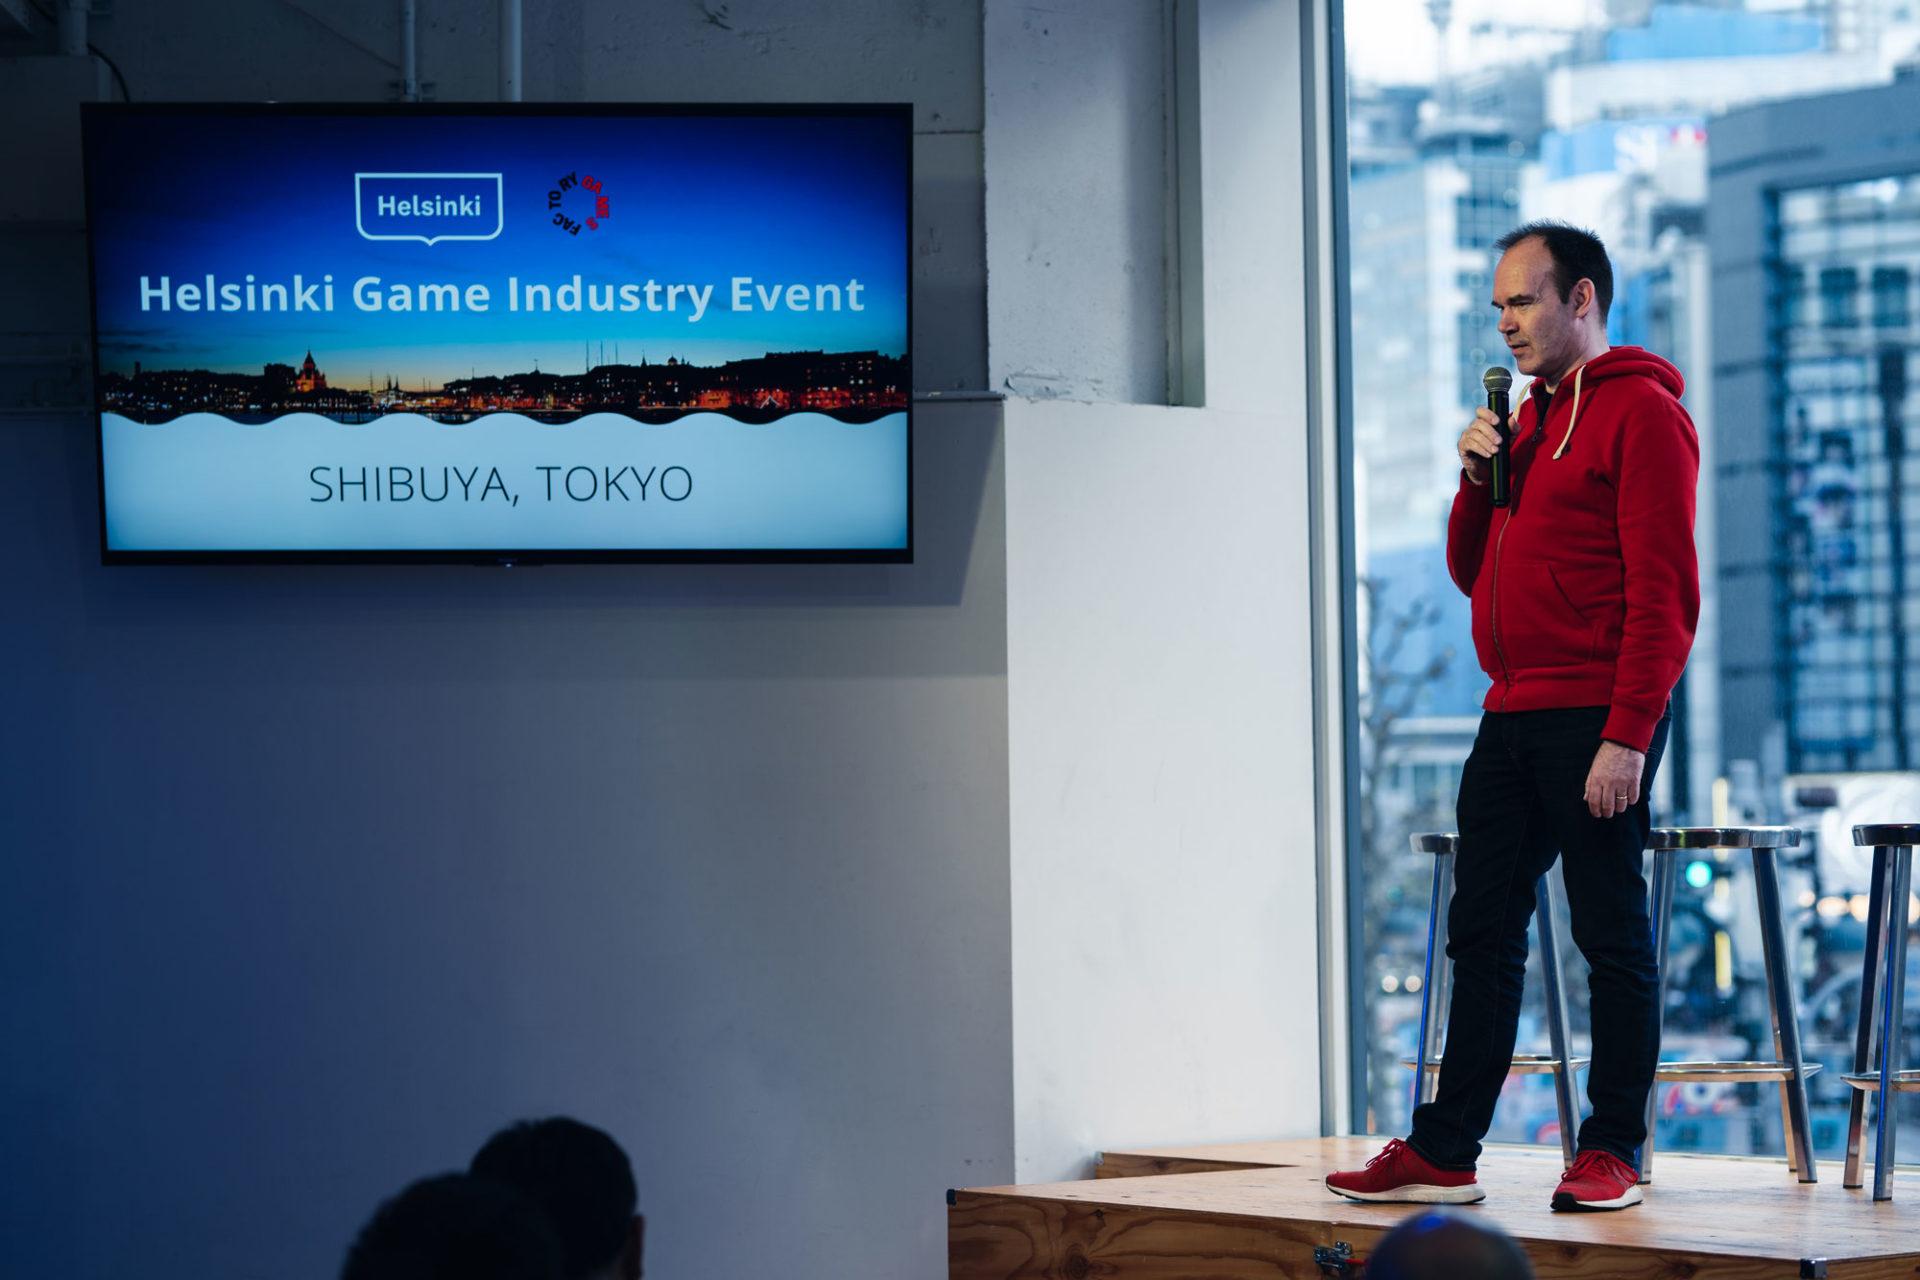 Helsinki Gaming Industry